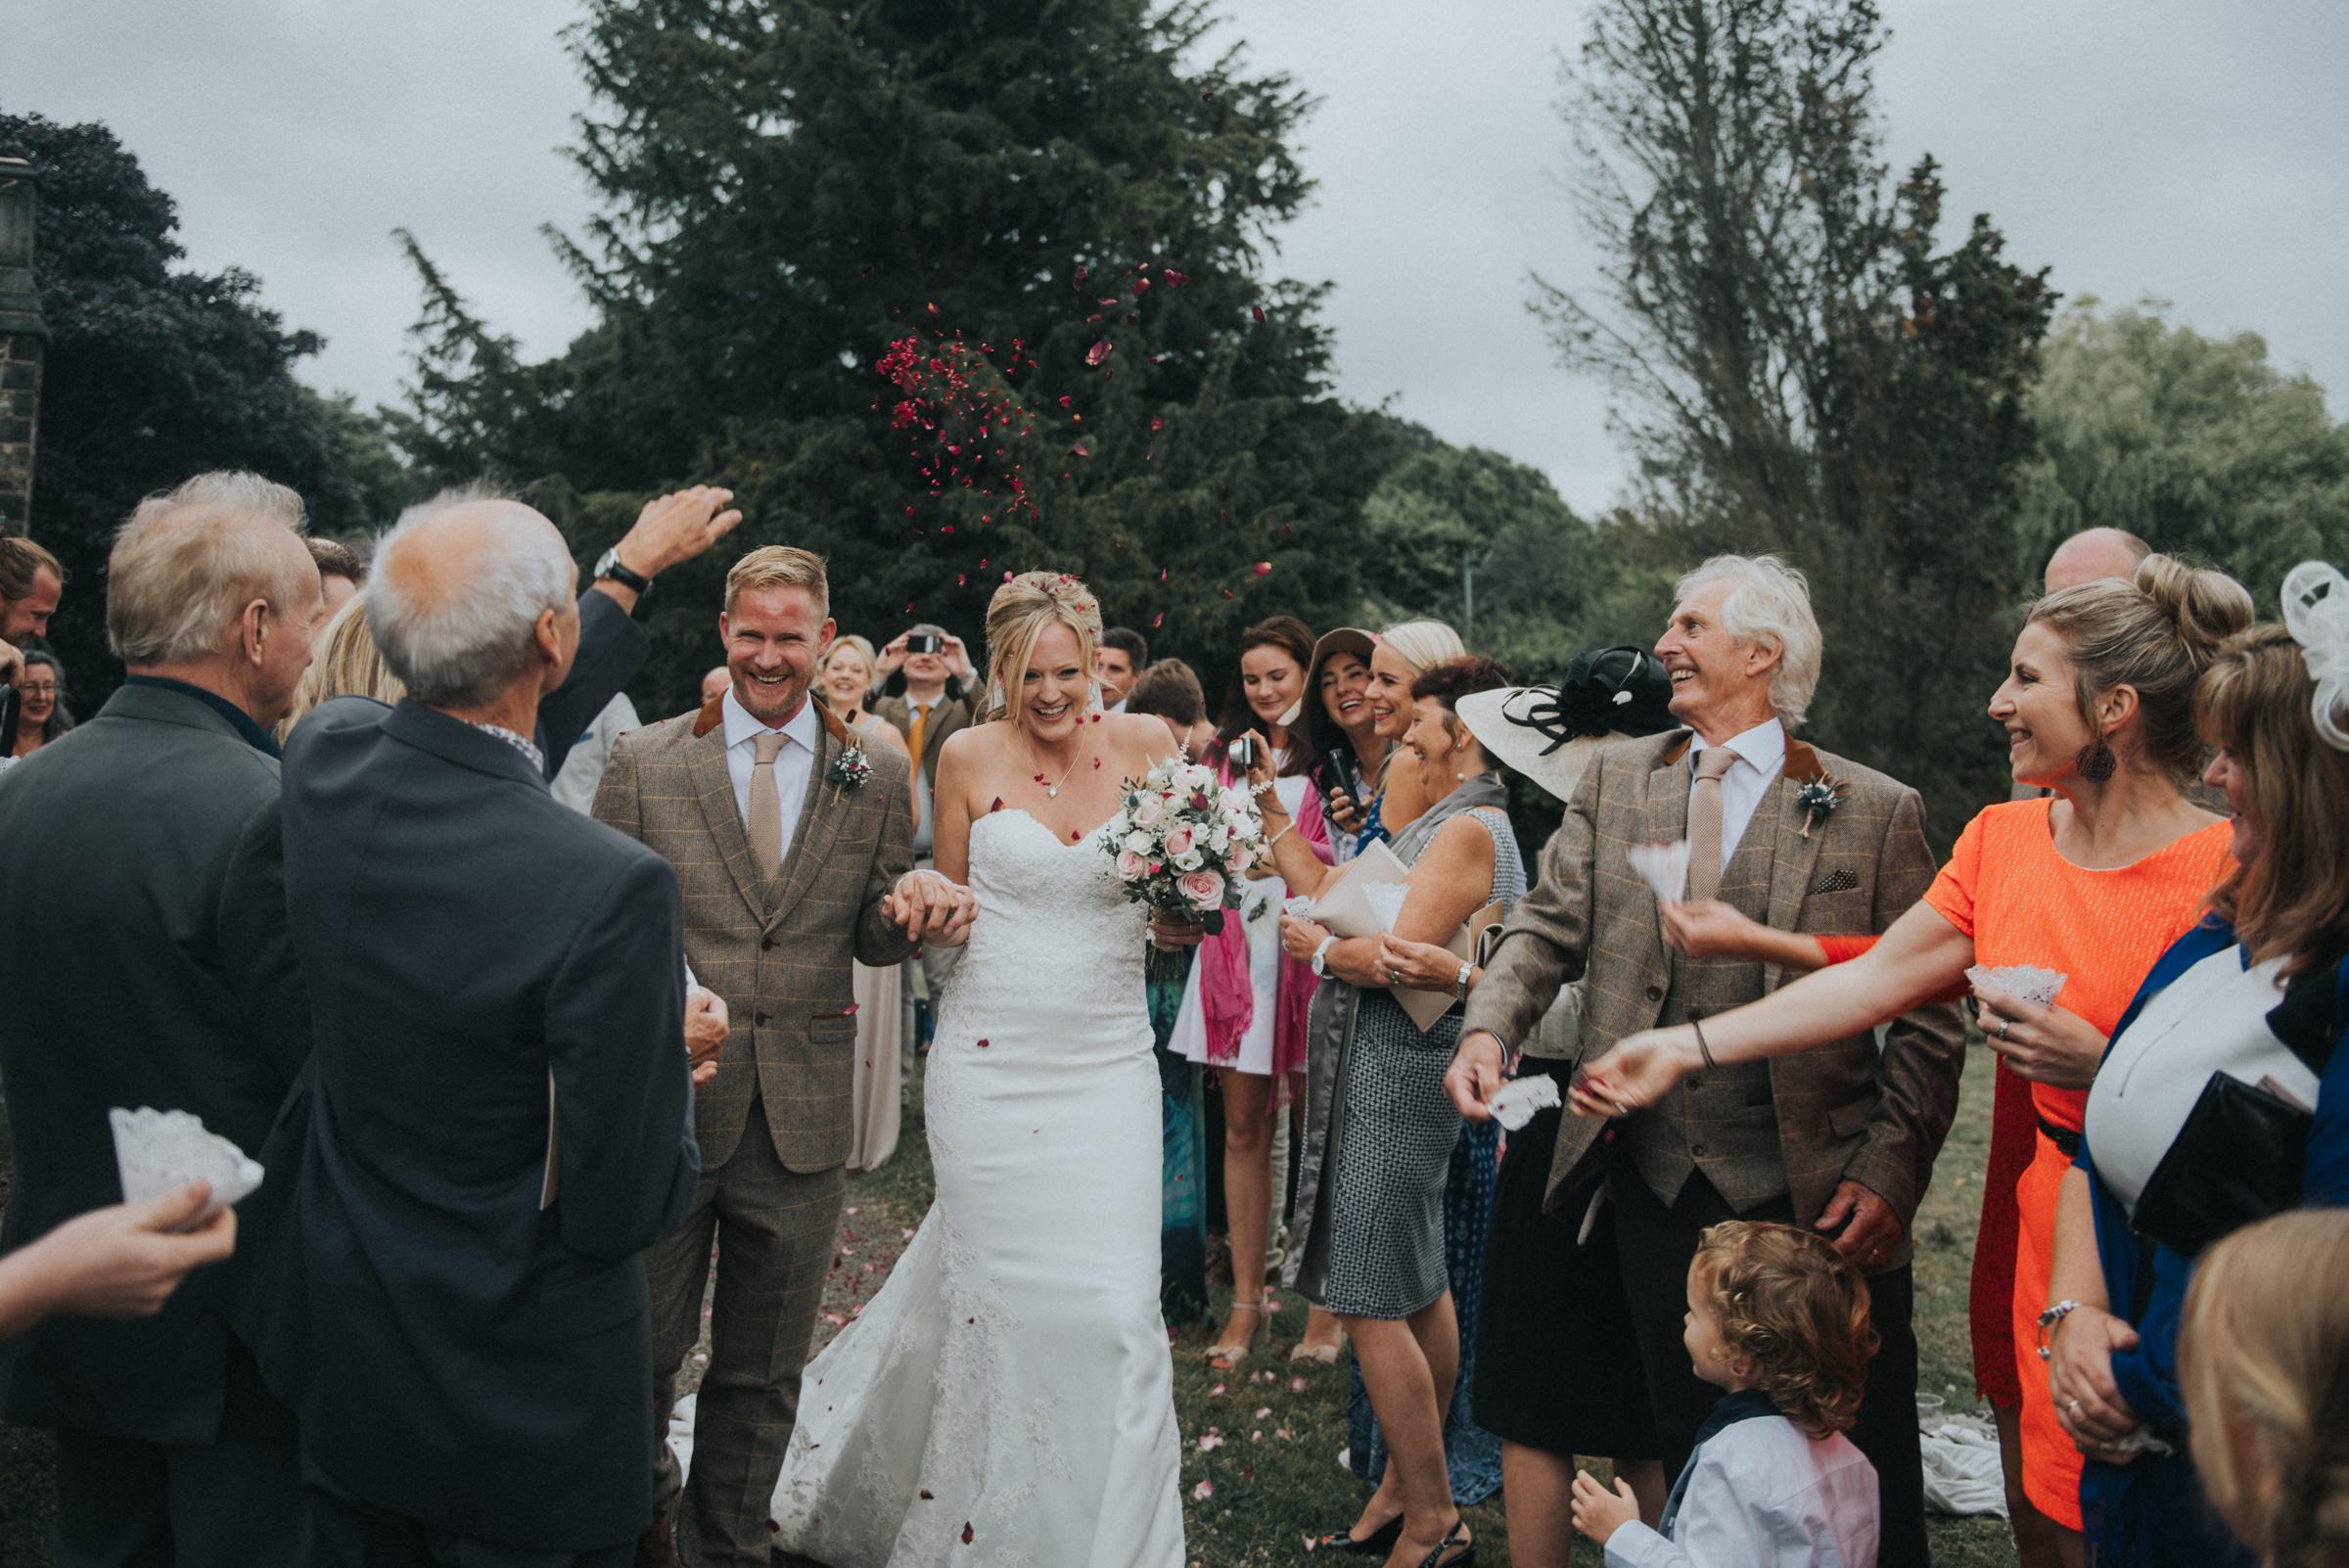 Falconhurst Kent Wedding Venue Sussex Weddings-1673.JPG